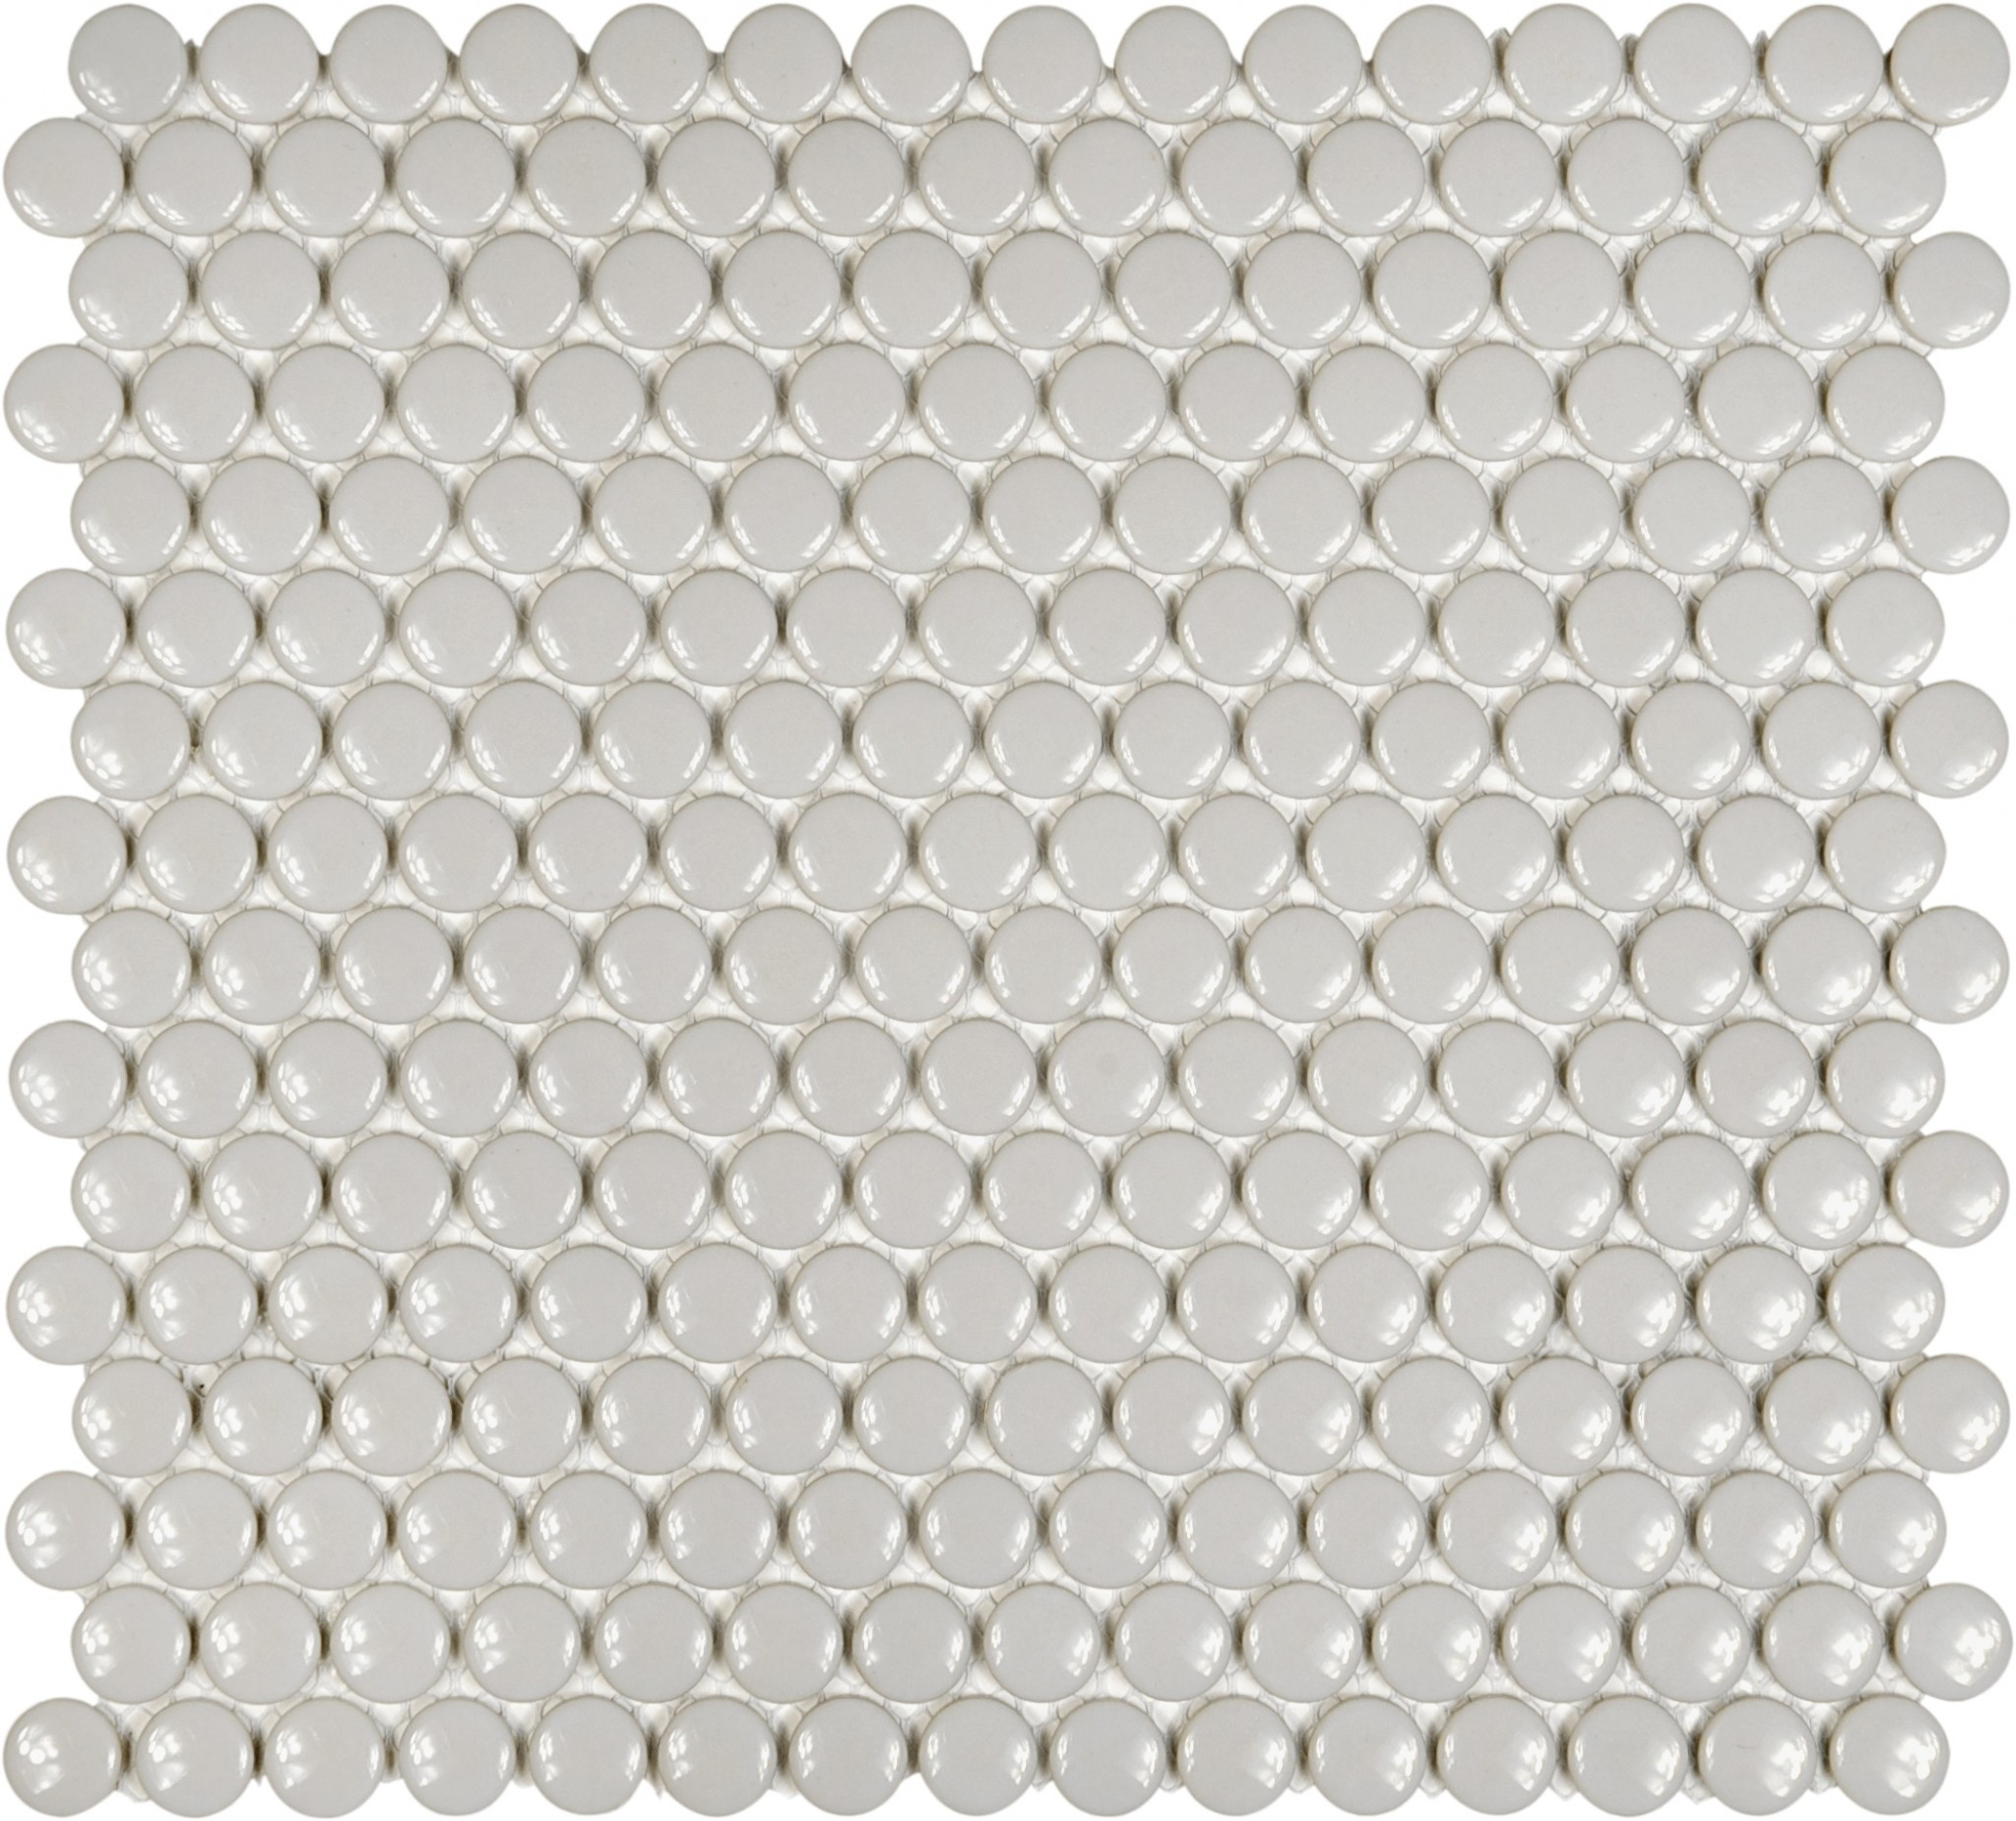 Soho Porcelain Mosaics Stone Solutions